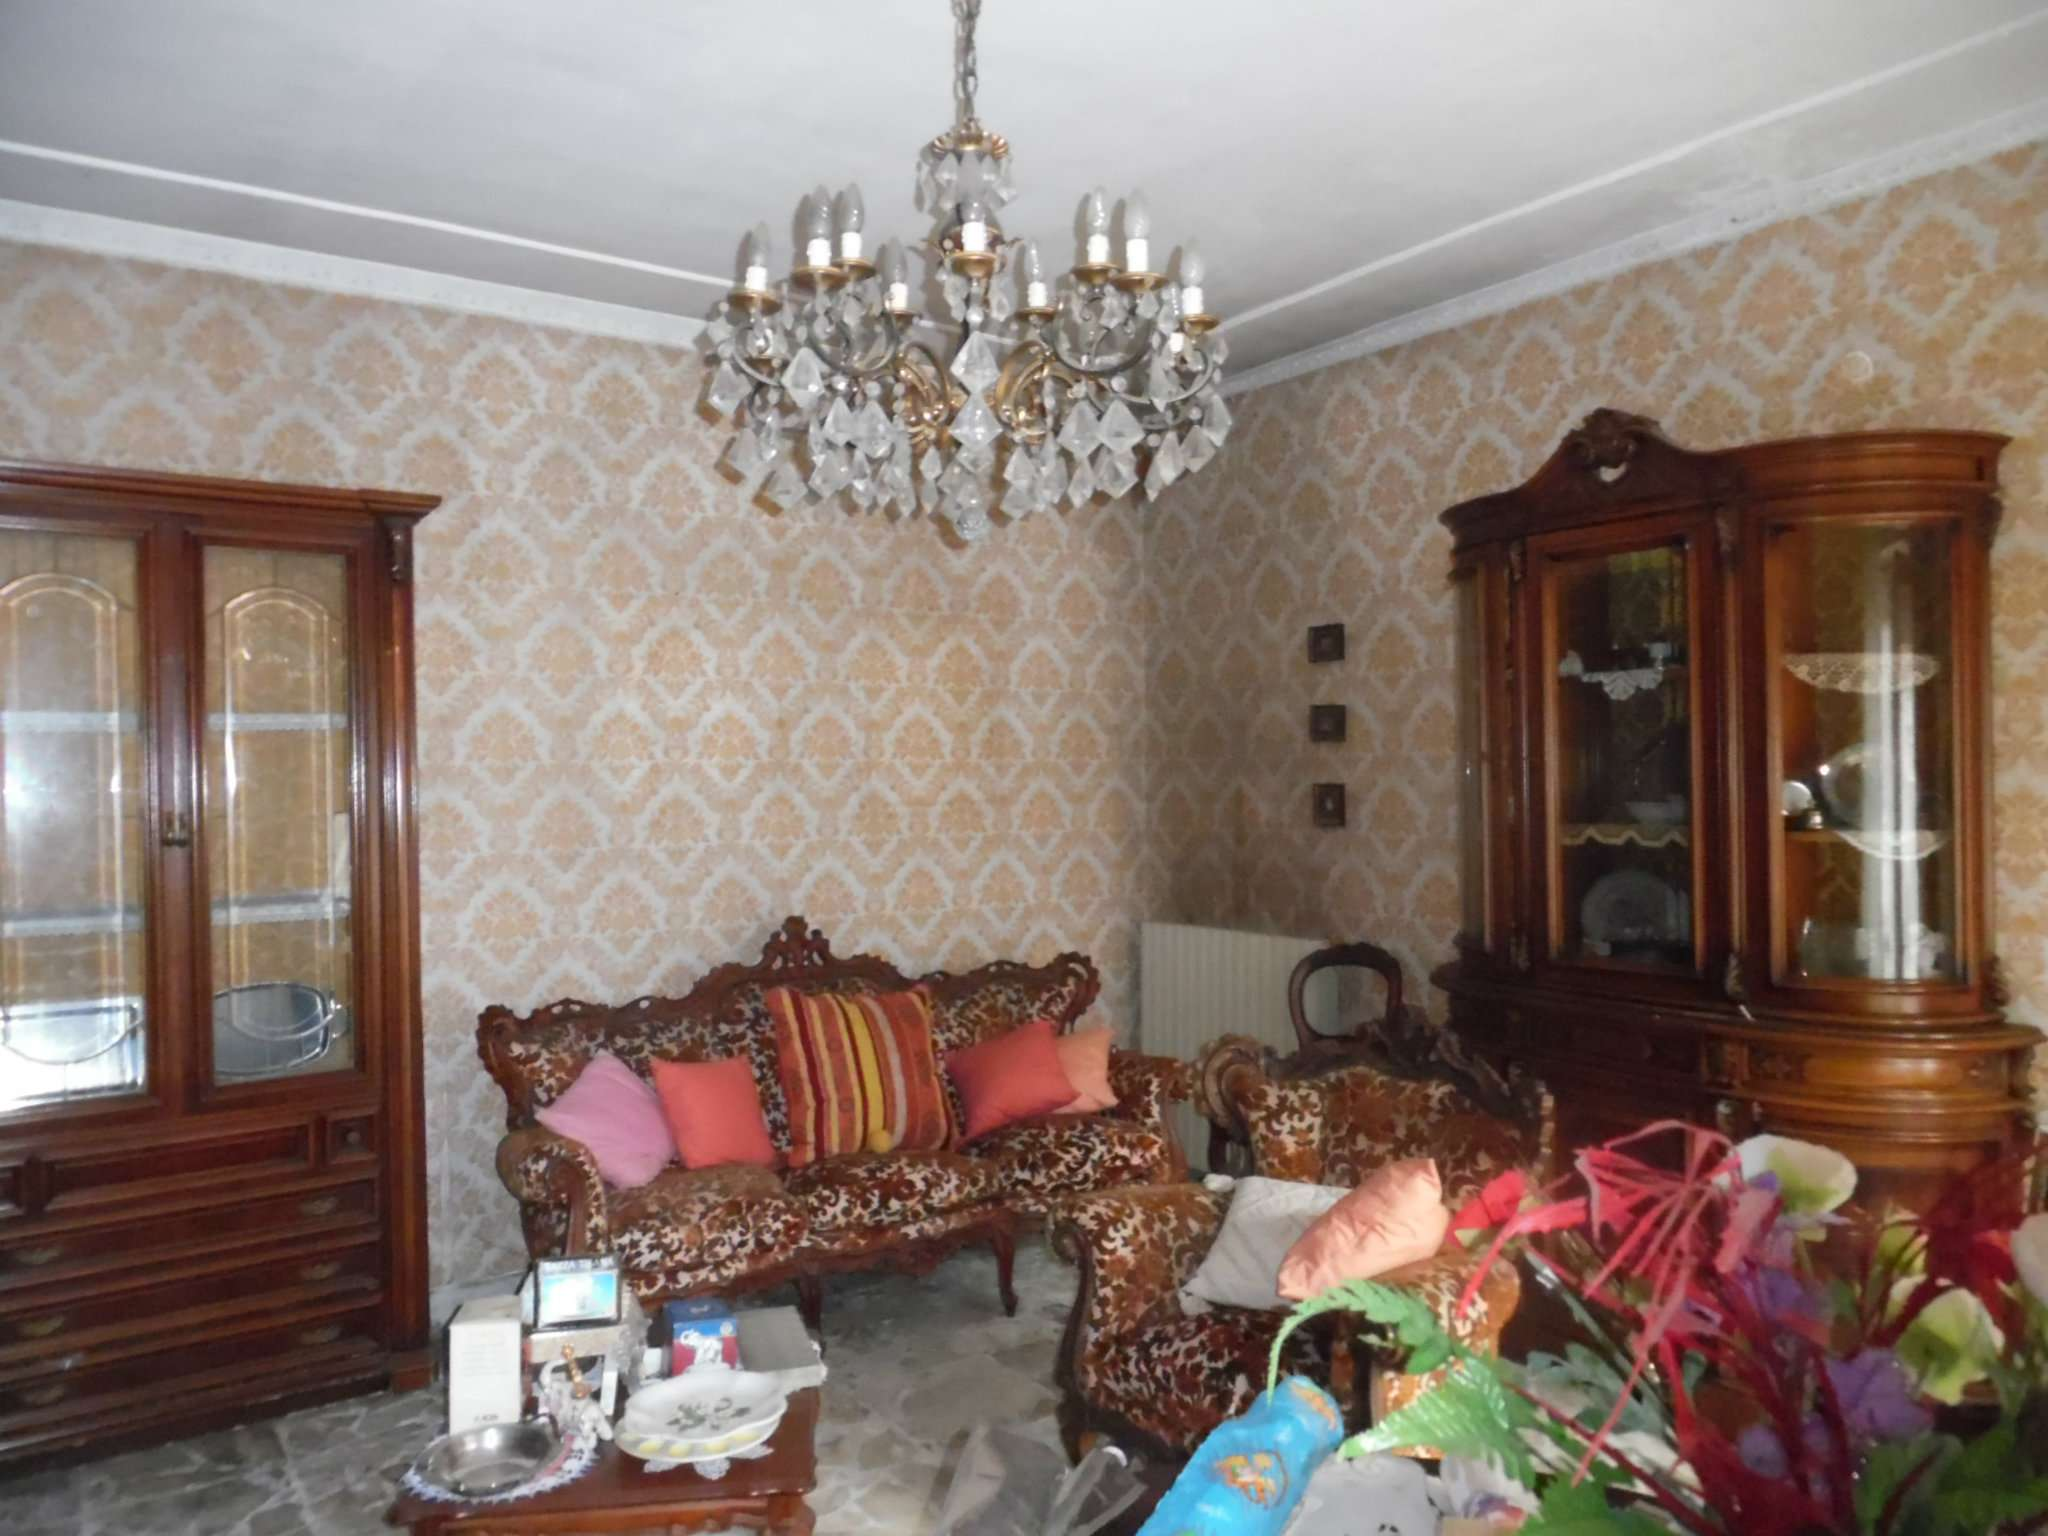 Casa Indipendente in condizioni mediocri in vendita Rif. 5274233